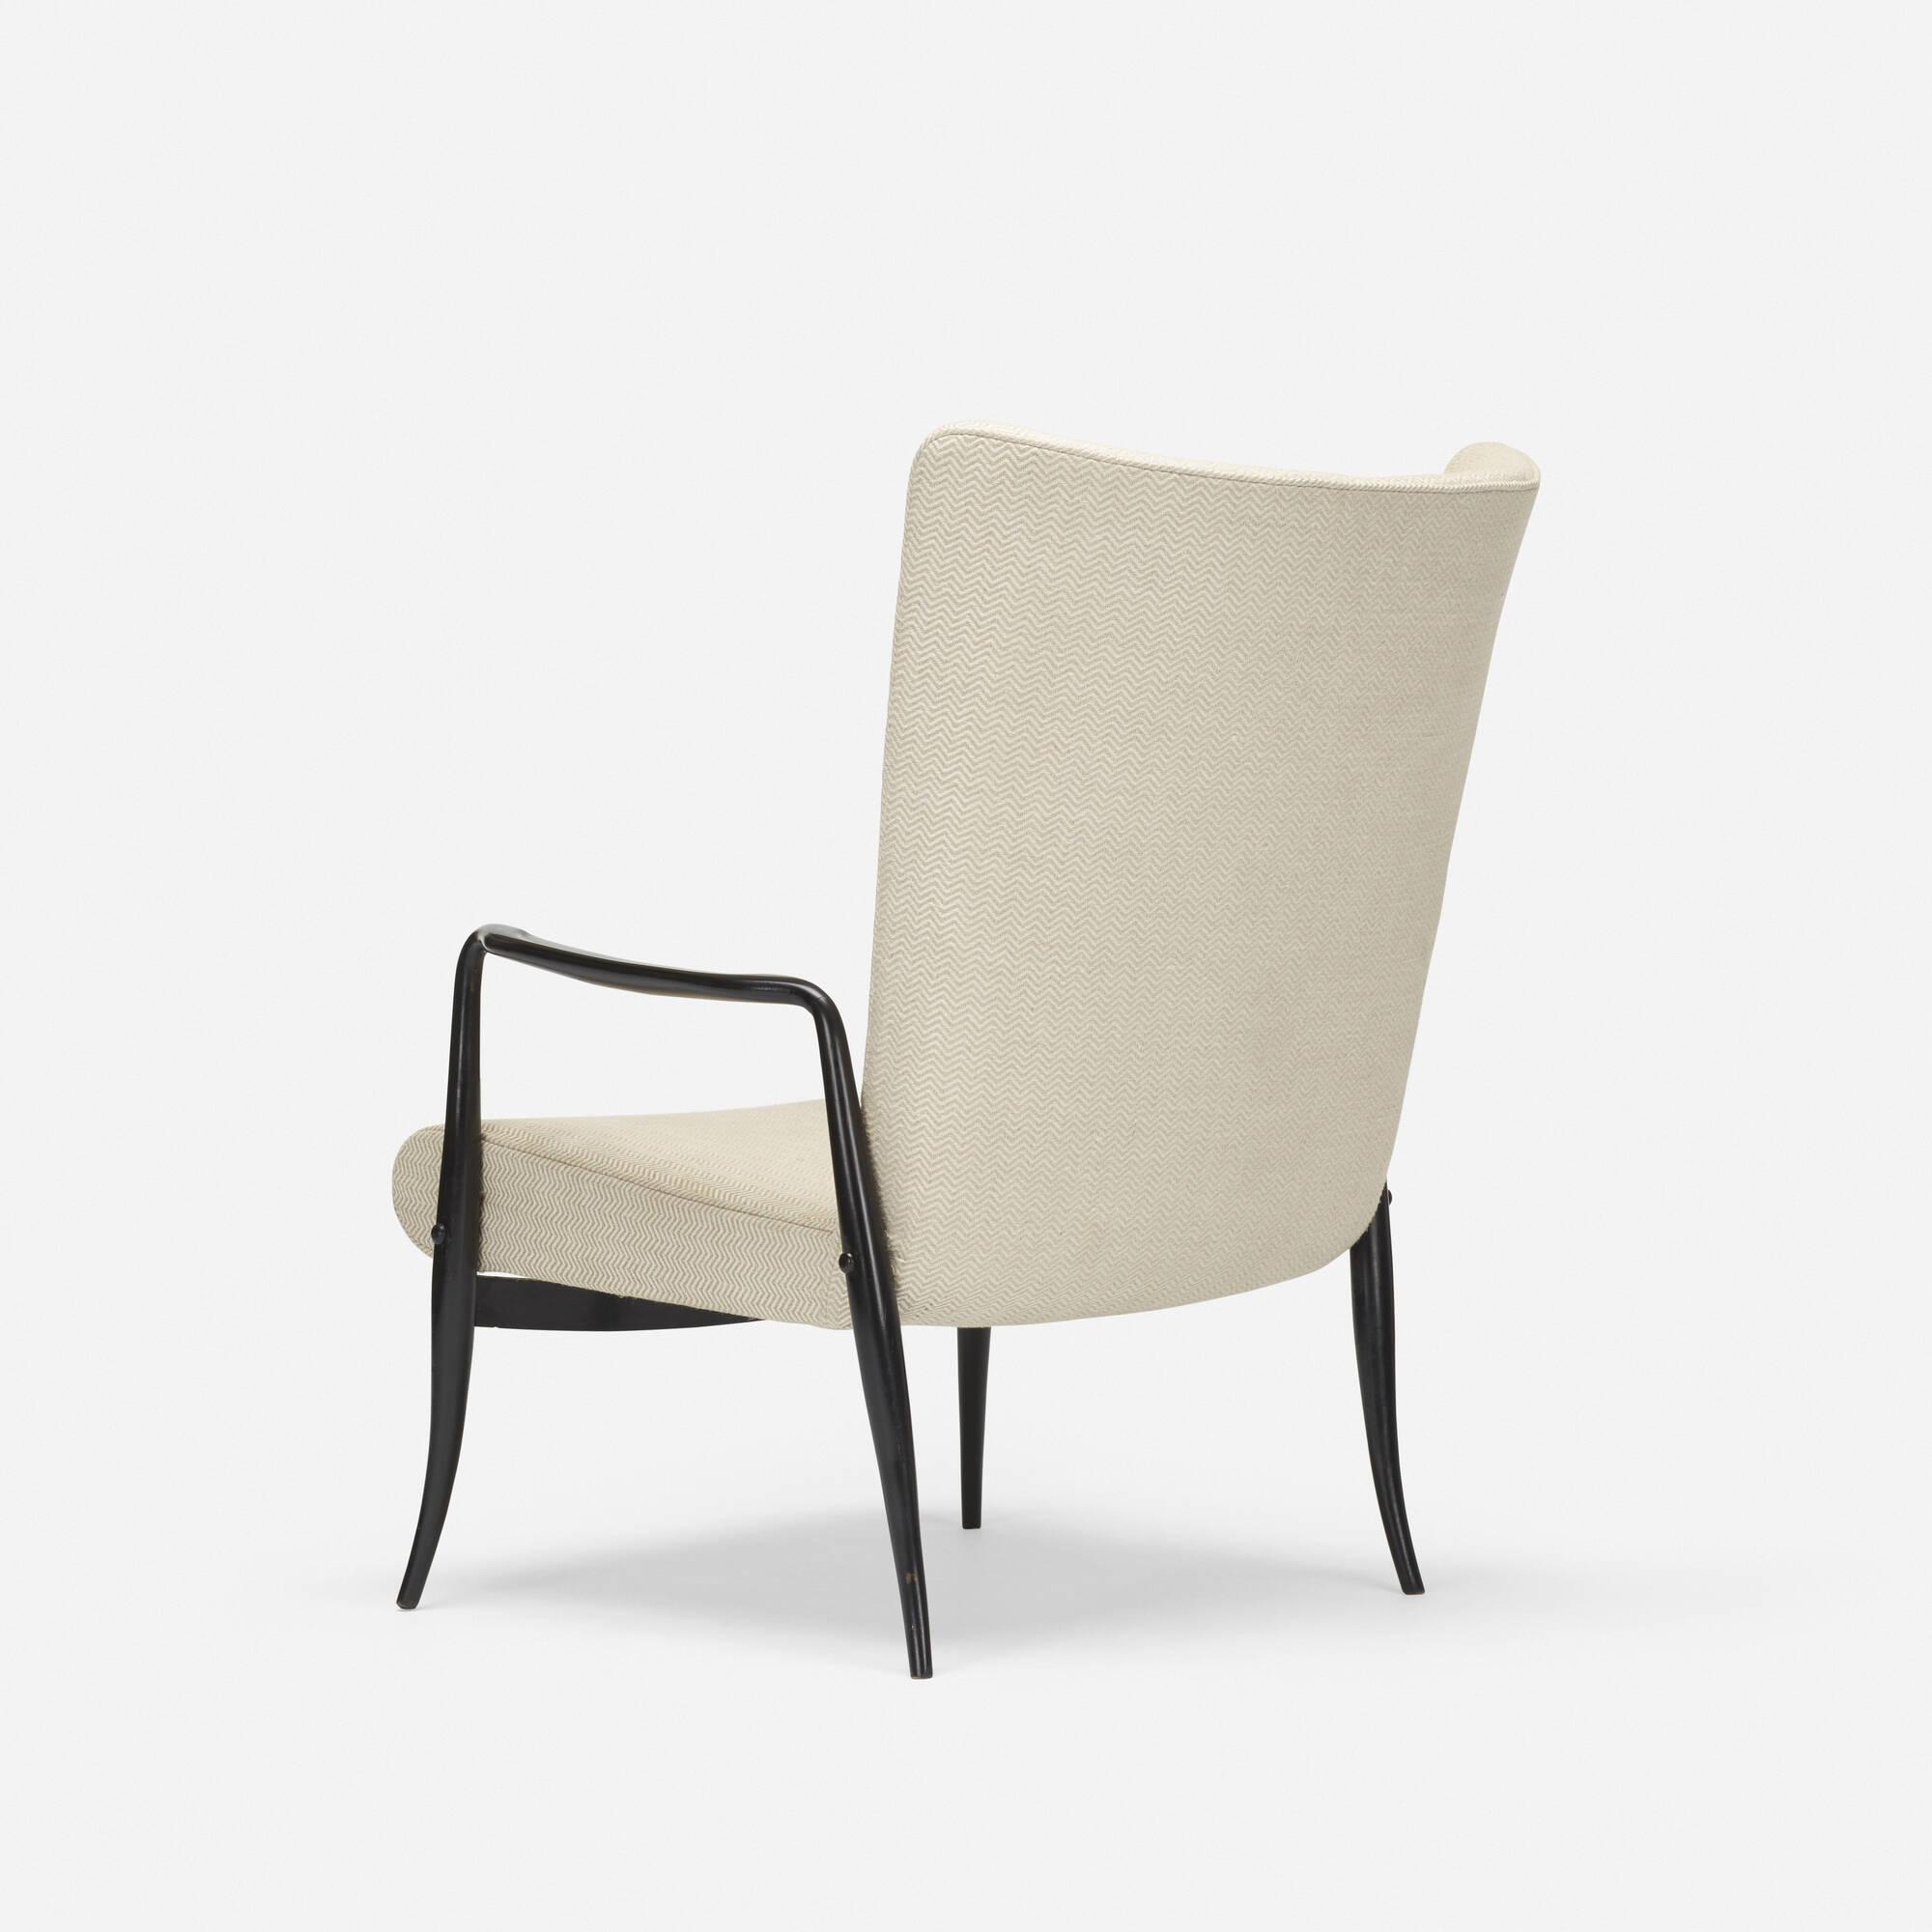 173: Brazilian / lounge chair (2 of 3)